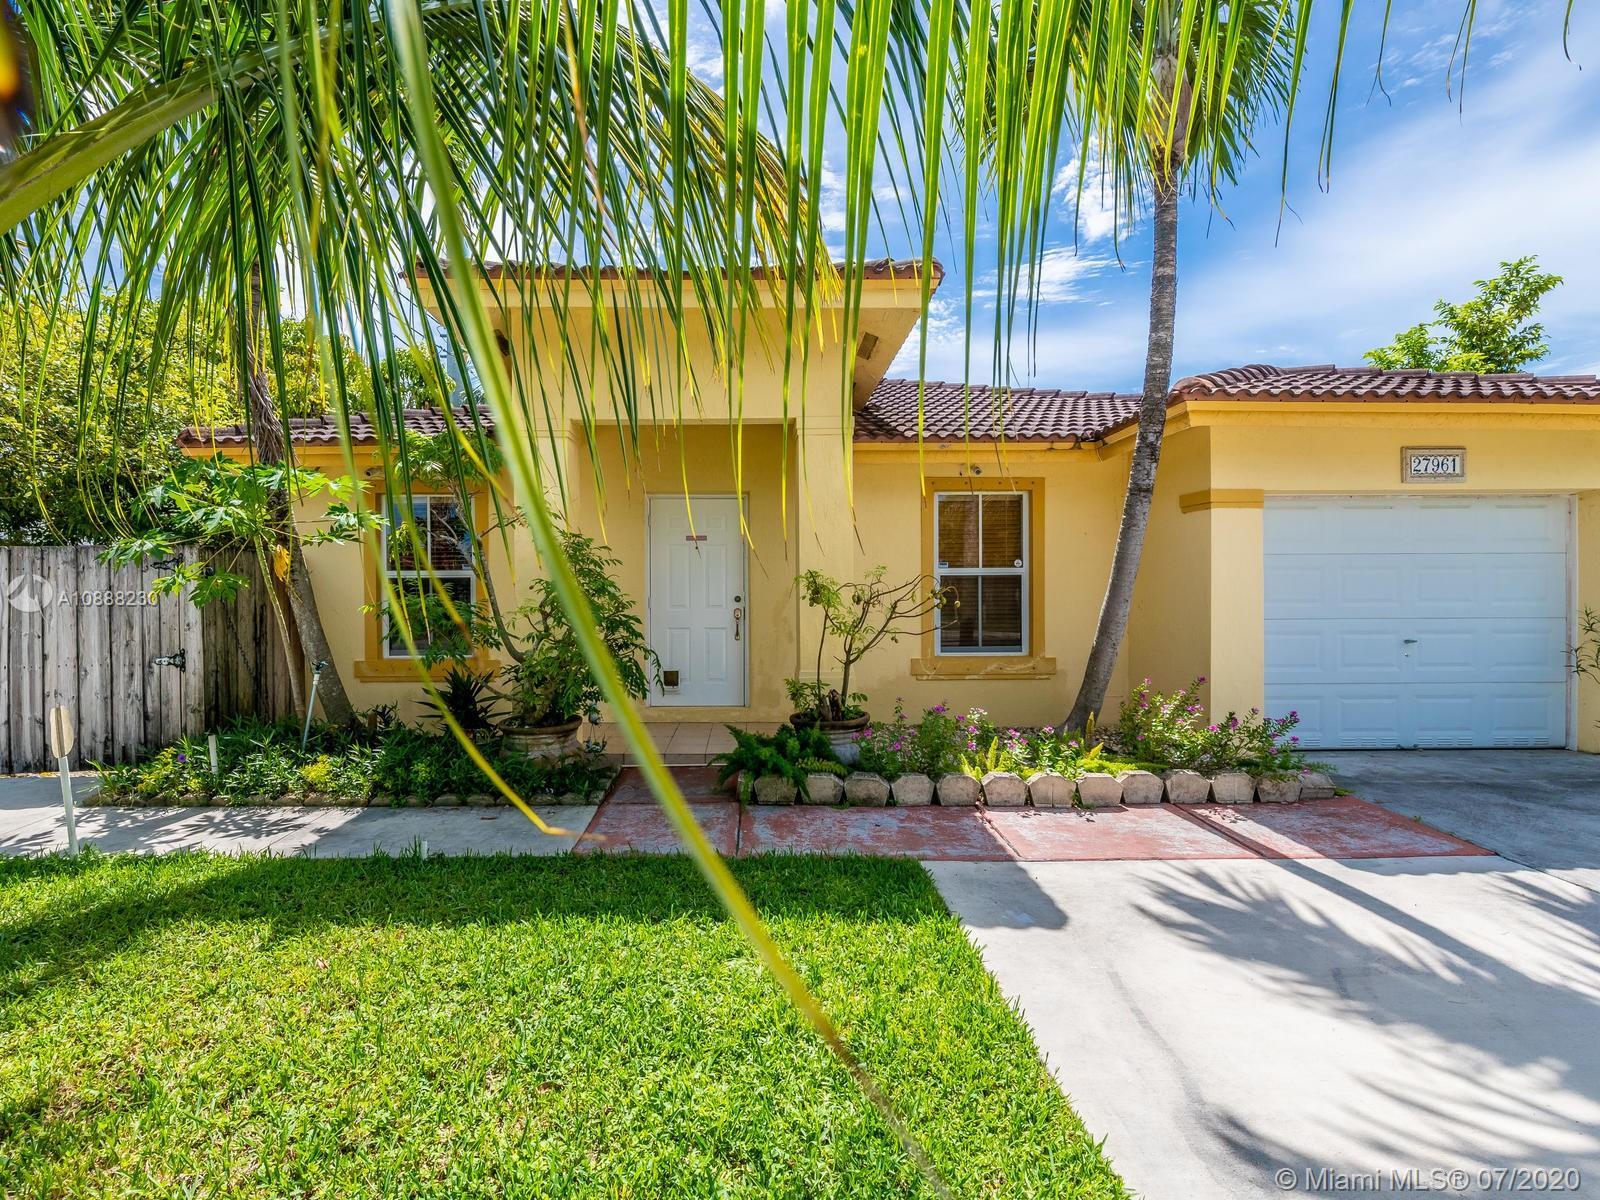 27961 SW 134th Pl Property Photo - Homestead, FL real estate listing